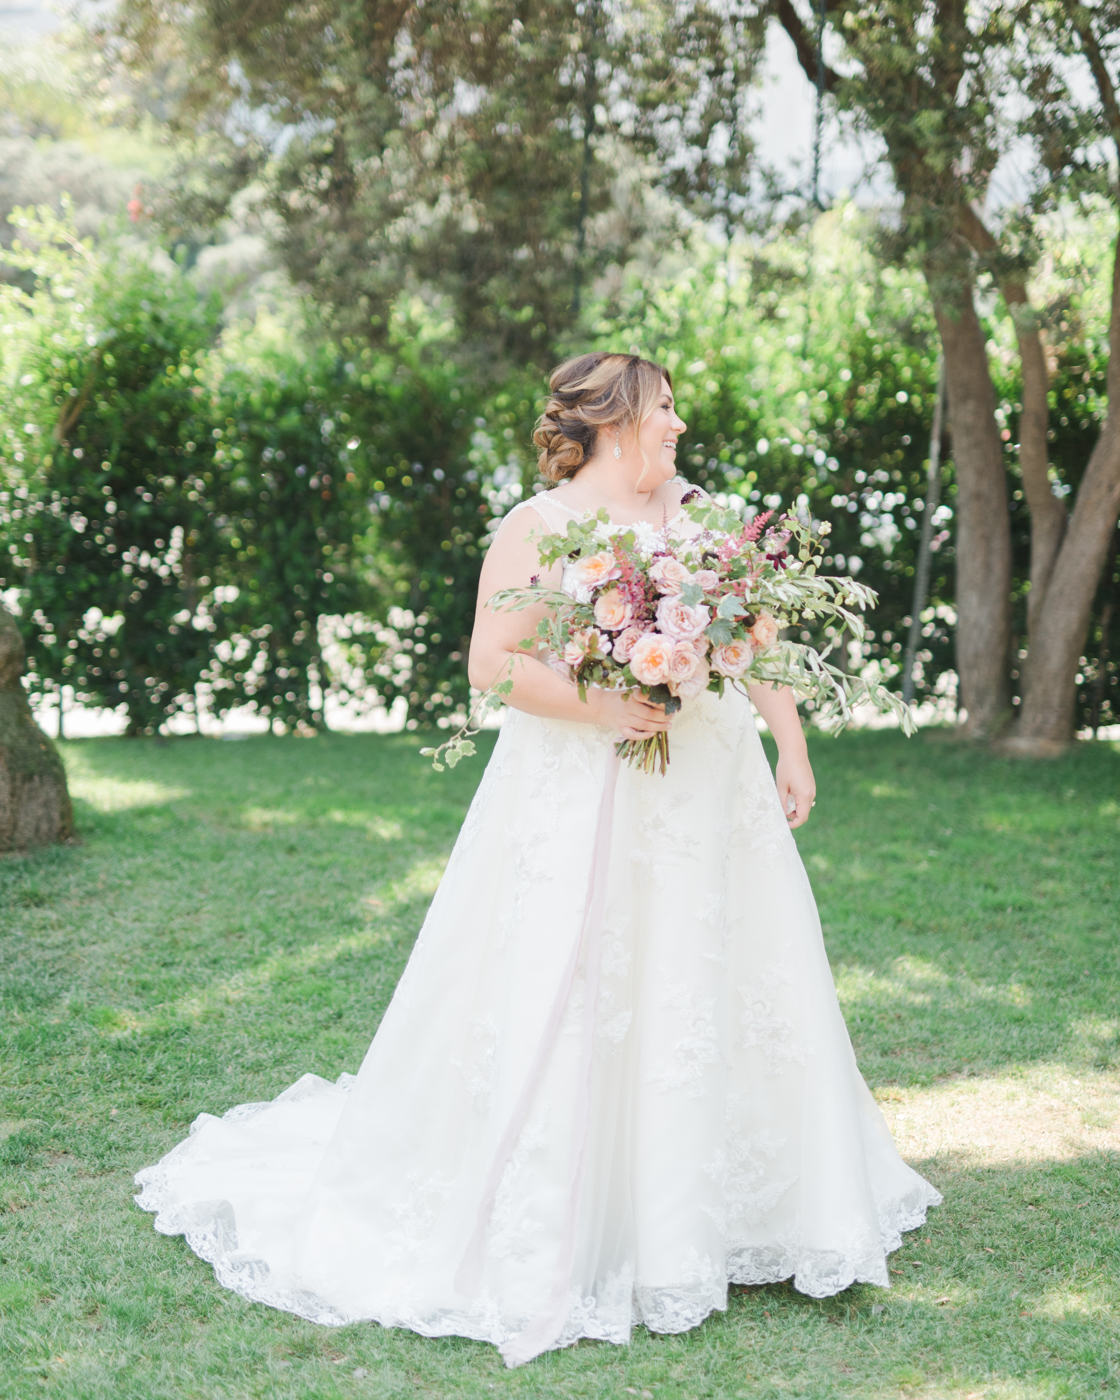 AKP_The_Victorian_Santa_Monica_Wedding_Photographer_Los_Angeles-7.jpg